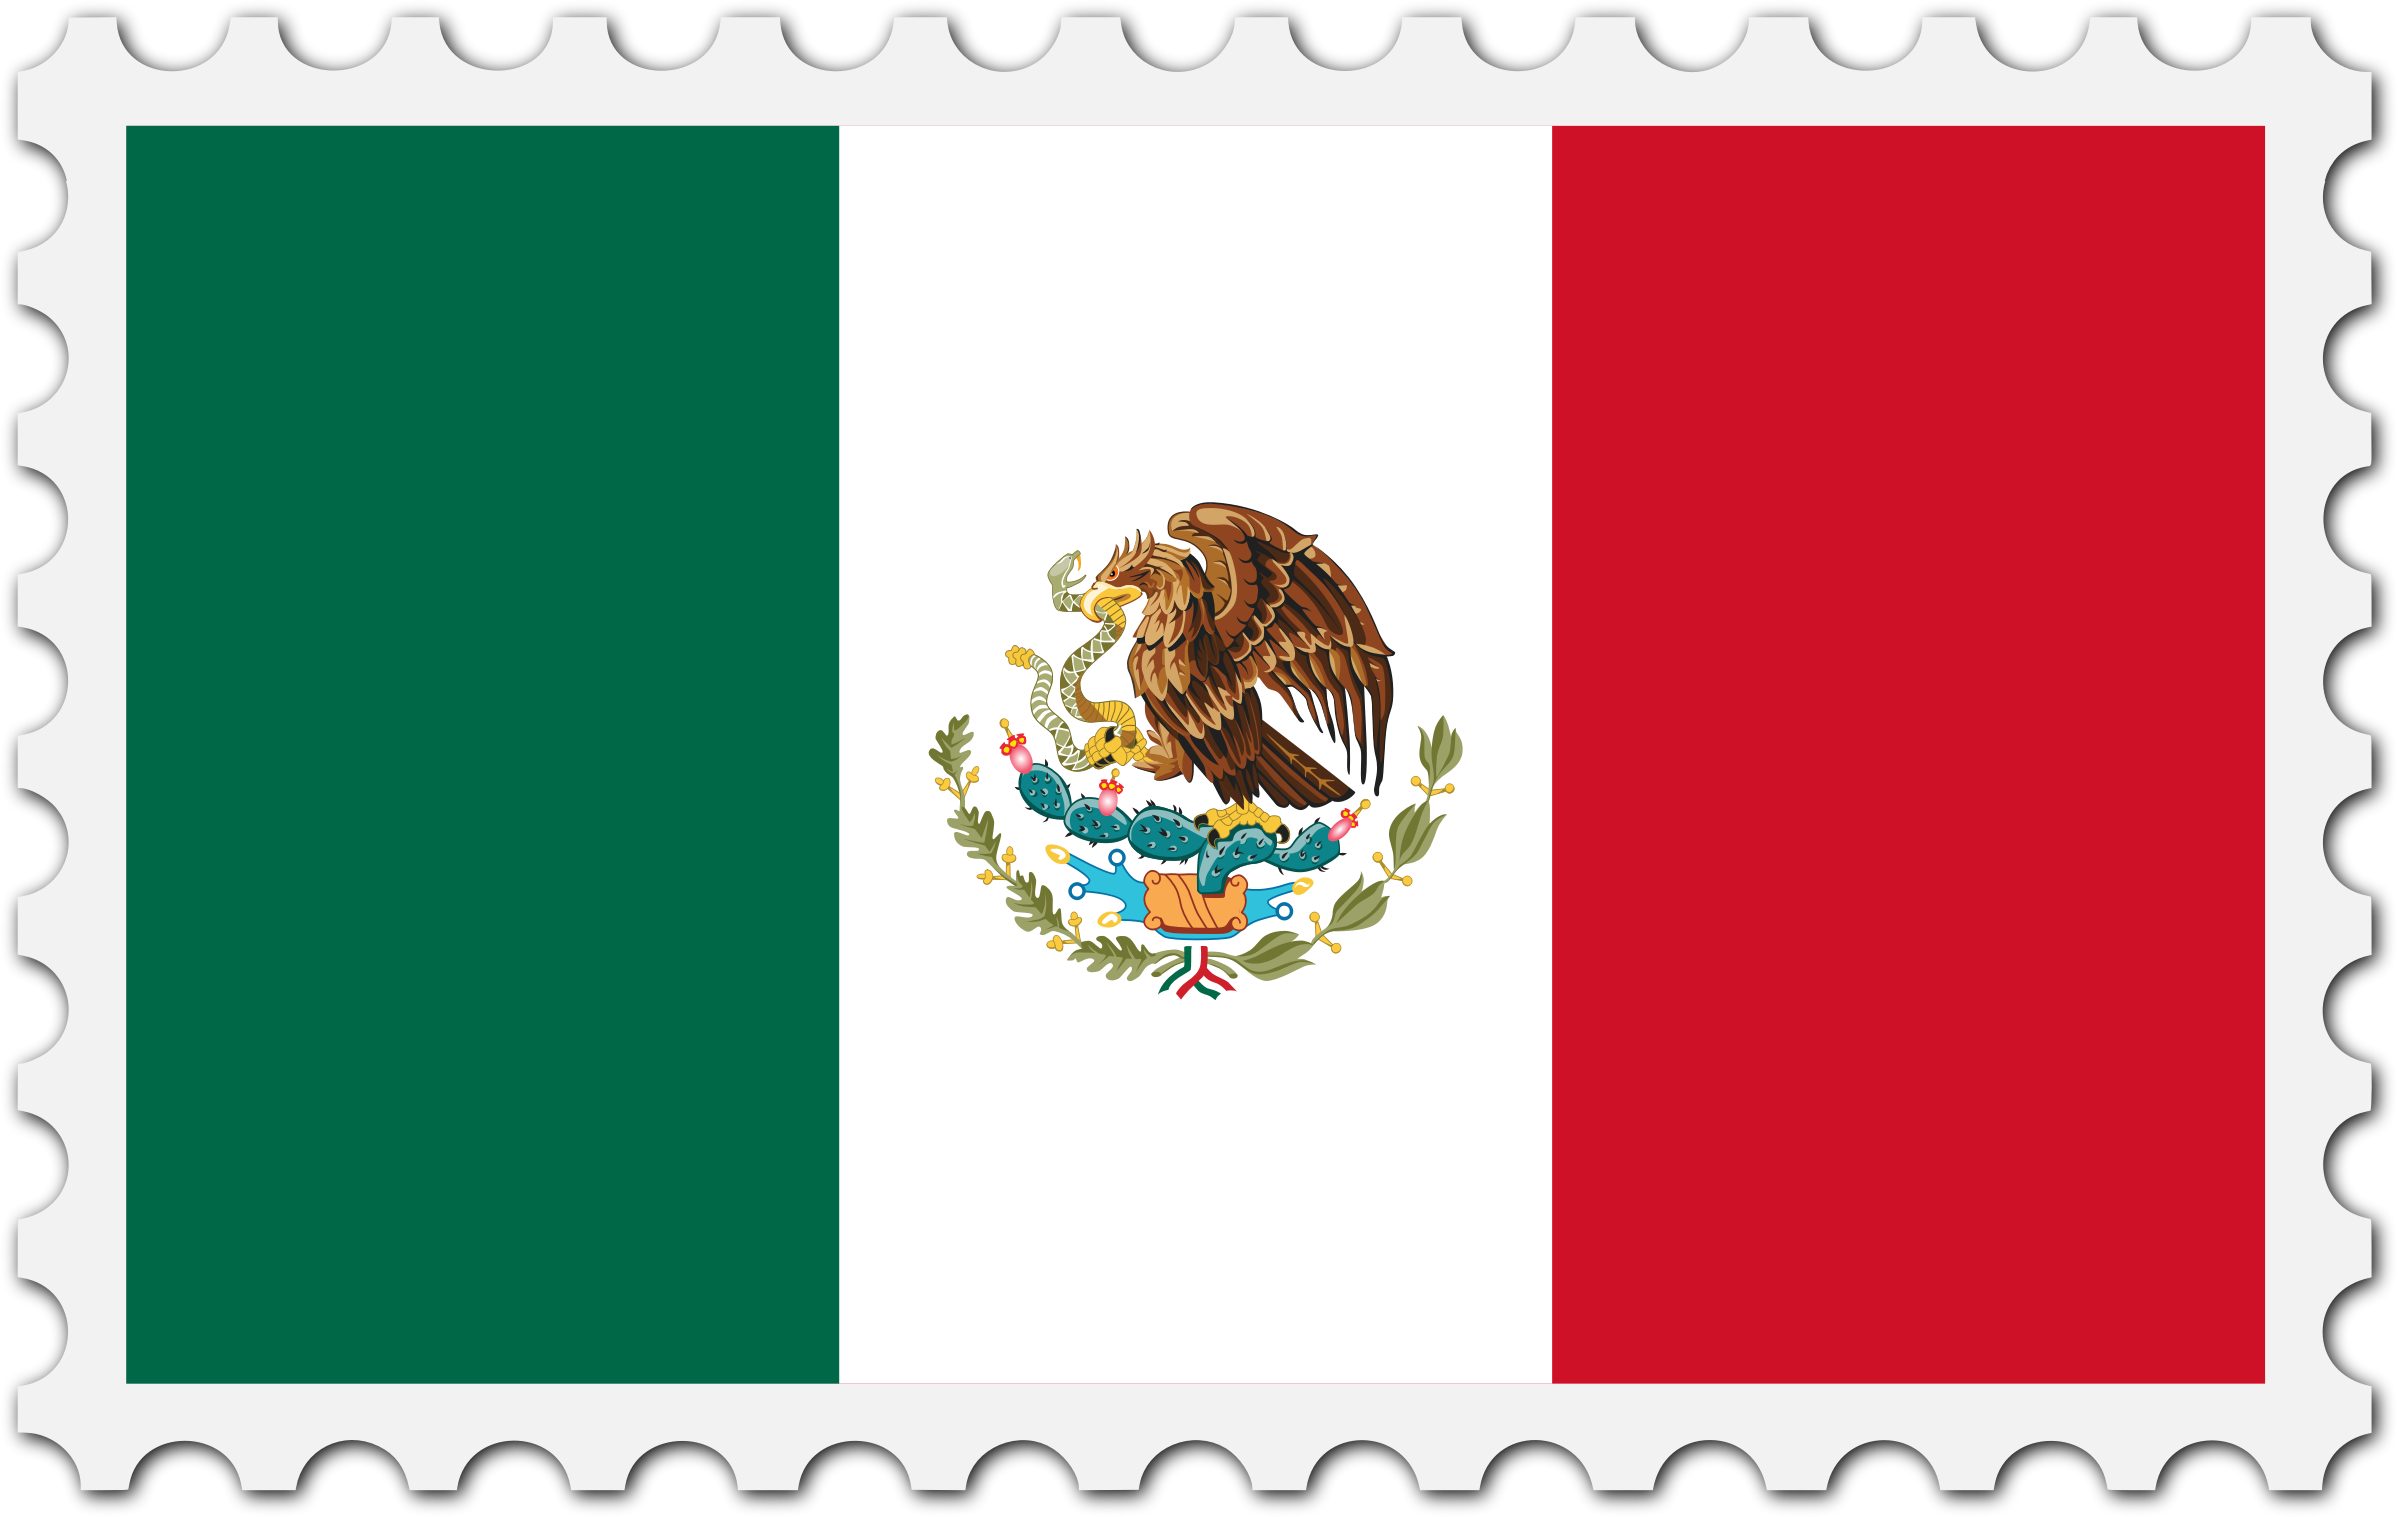 Flag of Mexico Bandera de Mexico / Mexican Flag United.